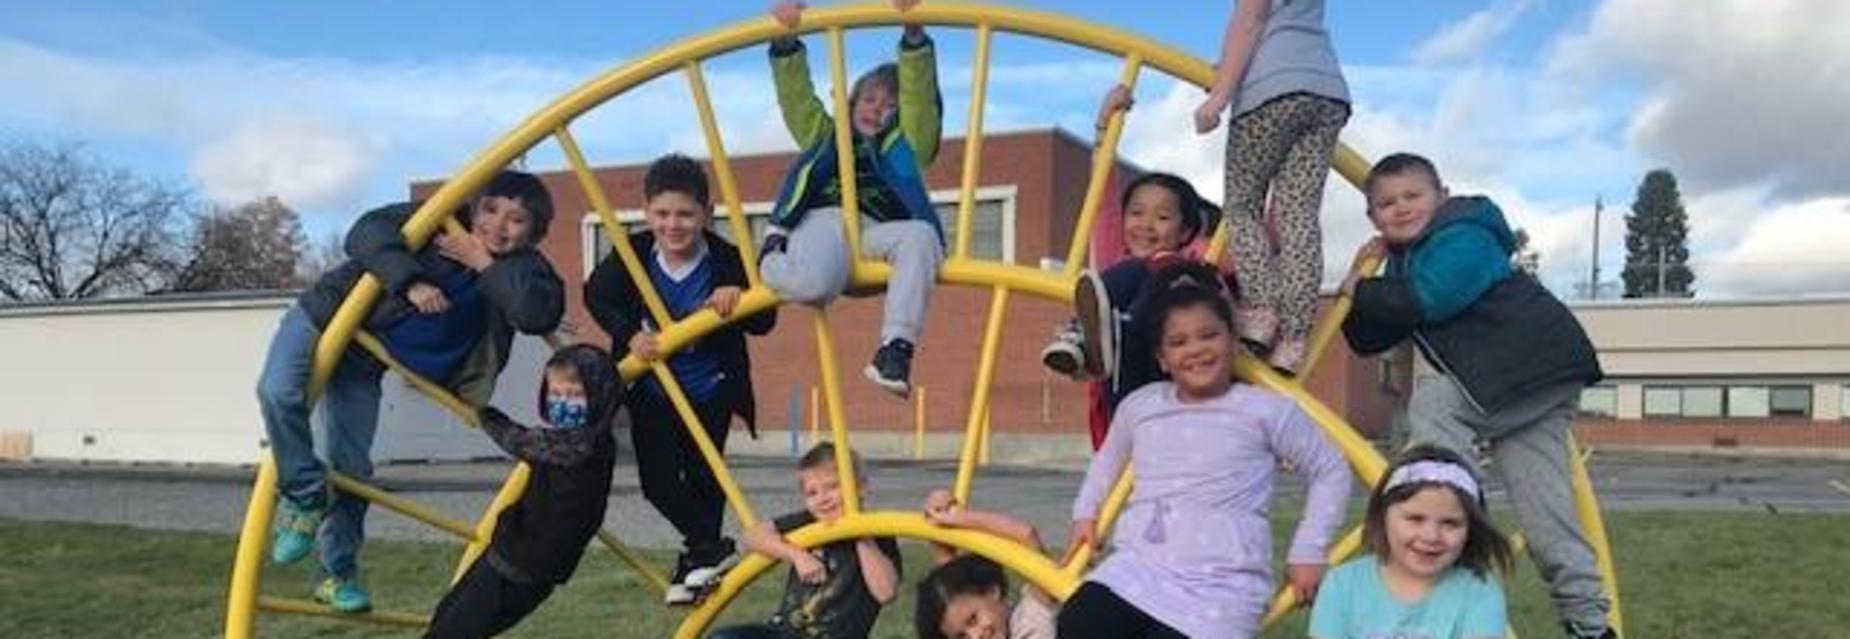 Kids outside at recess